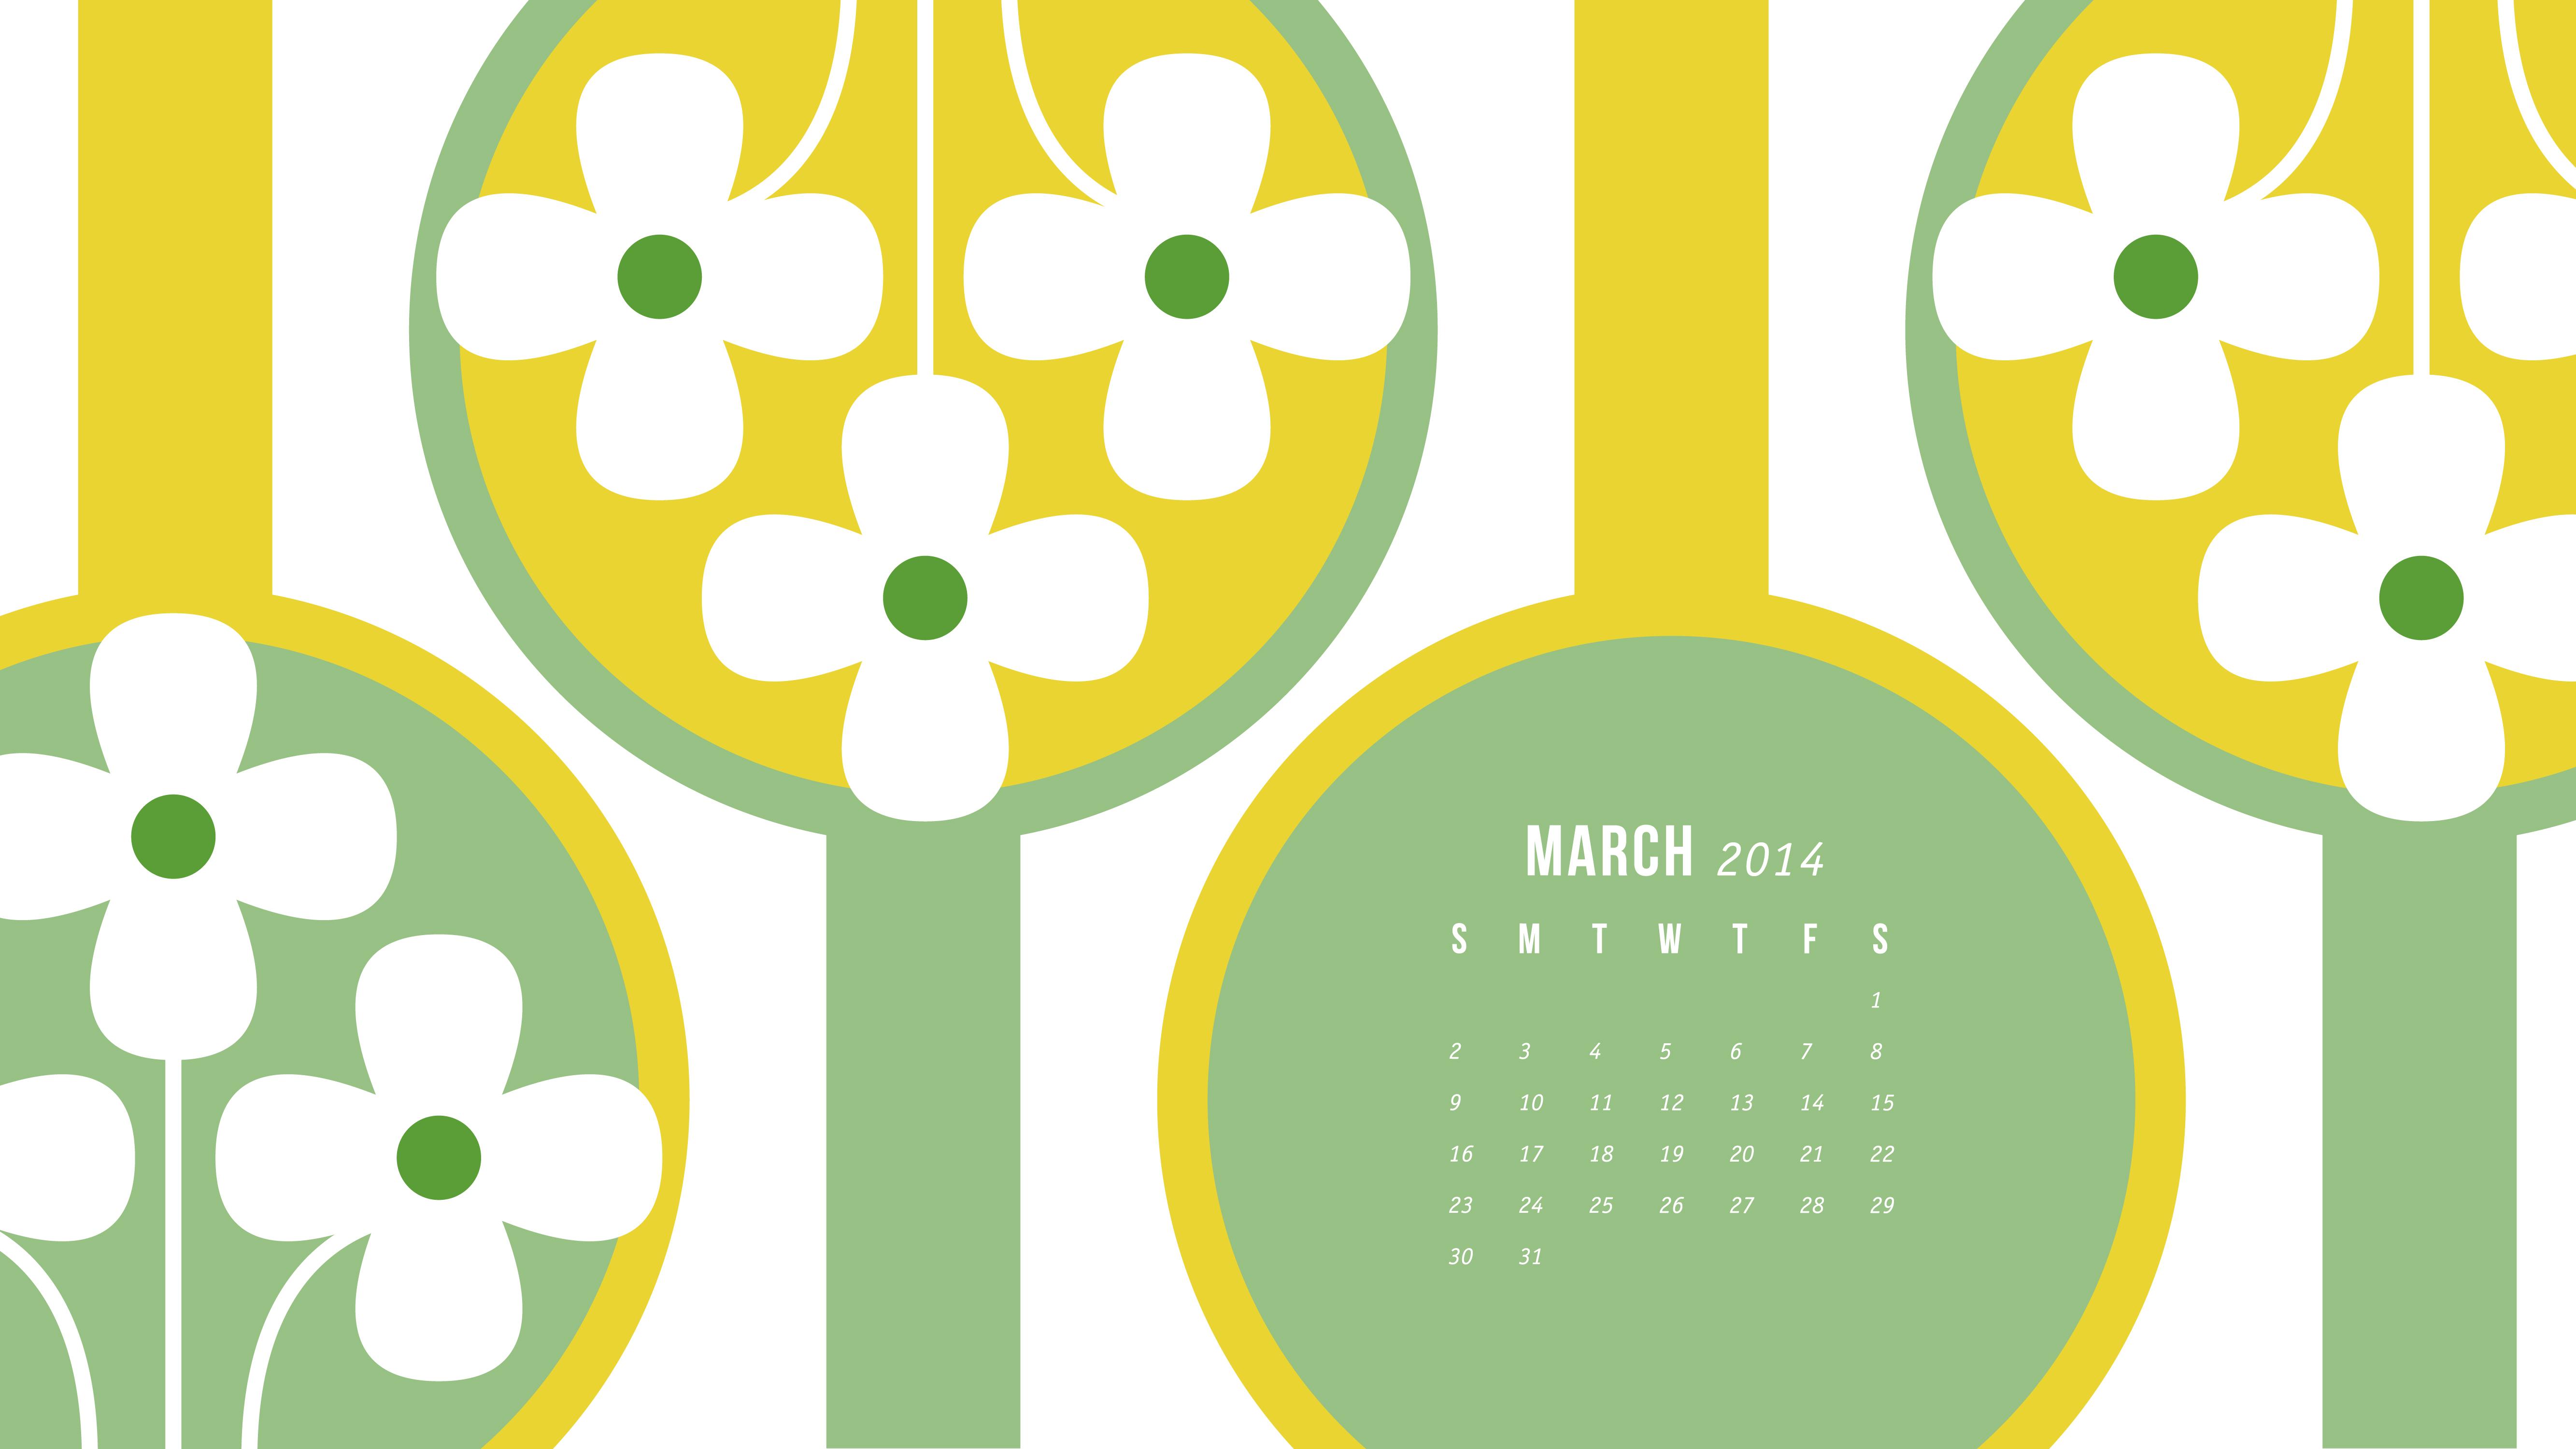 Sarah Hearts   March 2014 Calendar Wallpapers 5333x3000